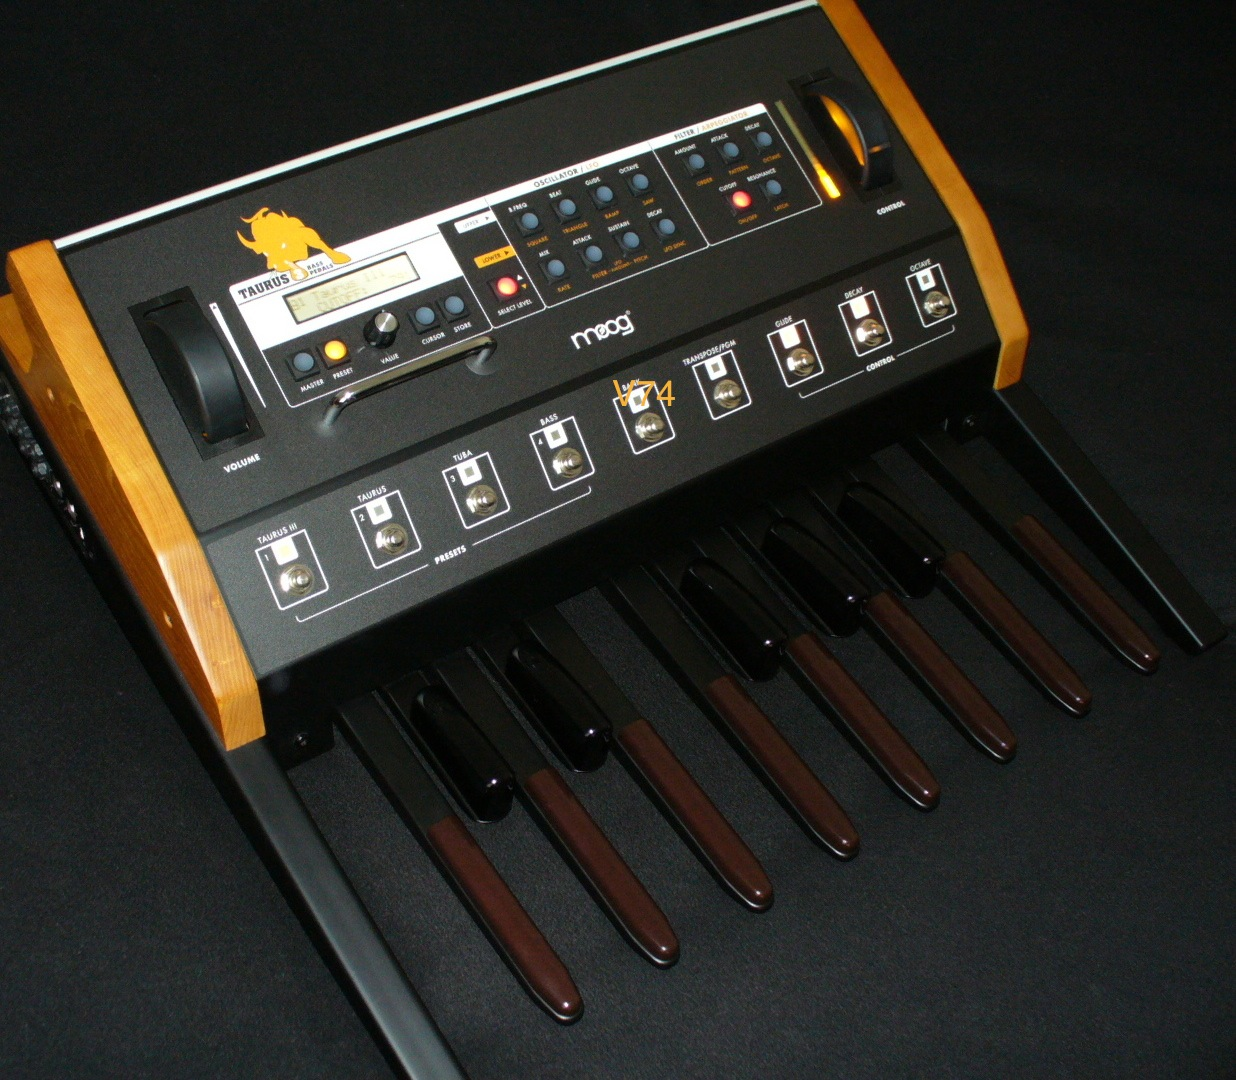 photo moog music taurus 3 bass pedals moog music taurus 3 bass pedals 99206 371700. Black Bedroom Furniture Sets. Home Design Ideas